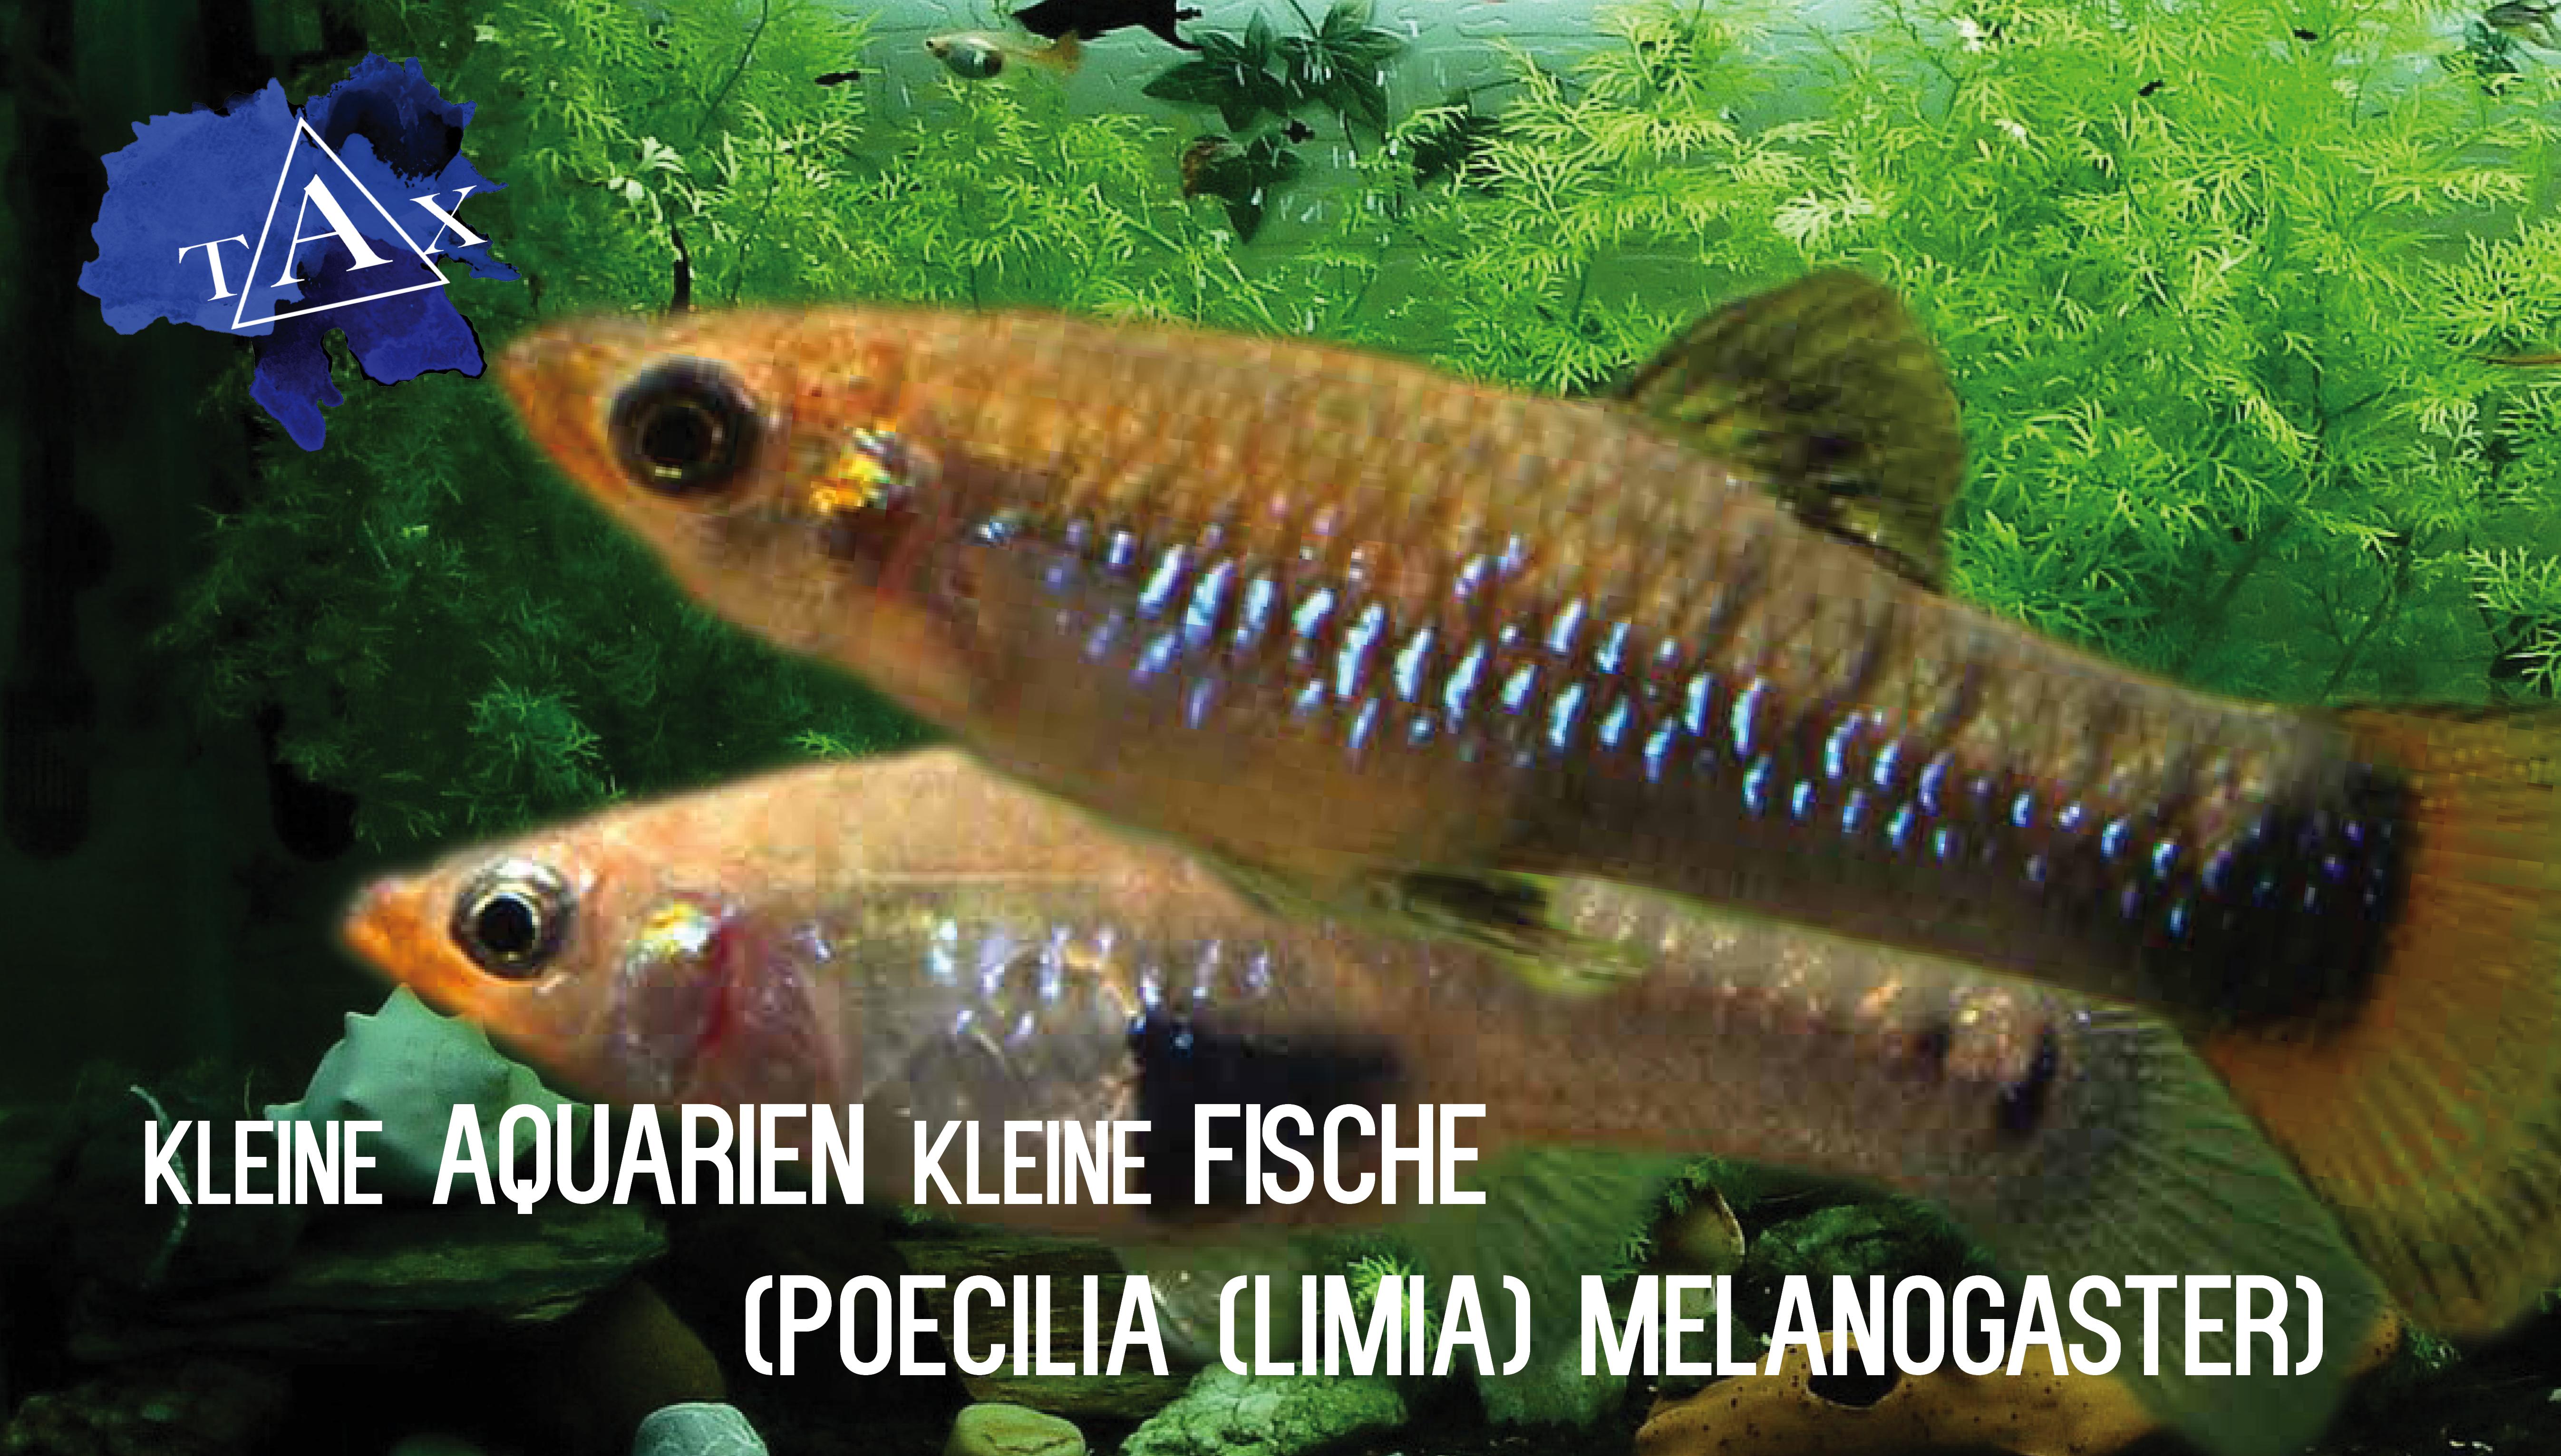 Poecilia melanogaster